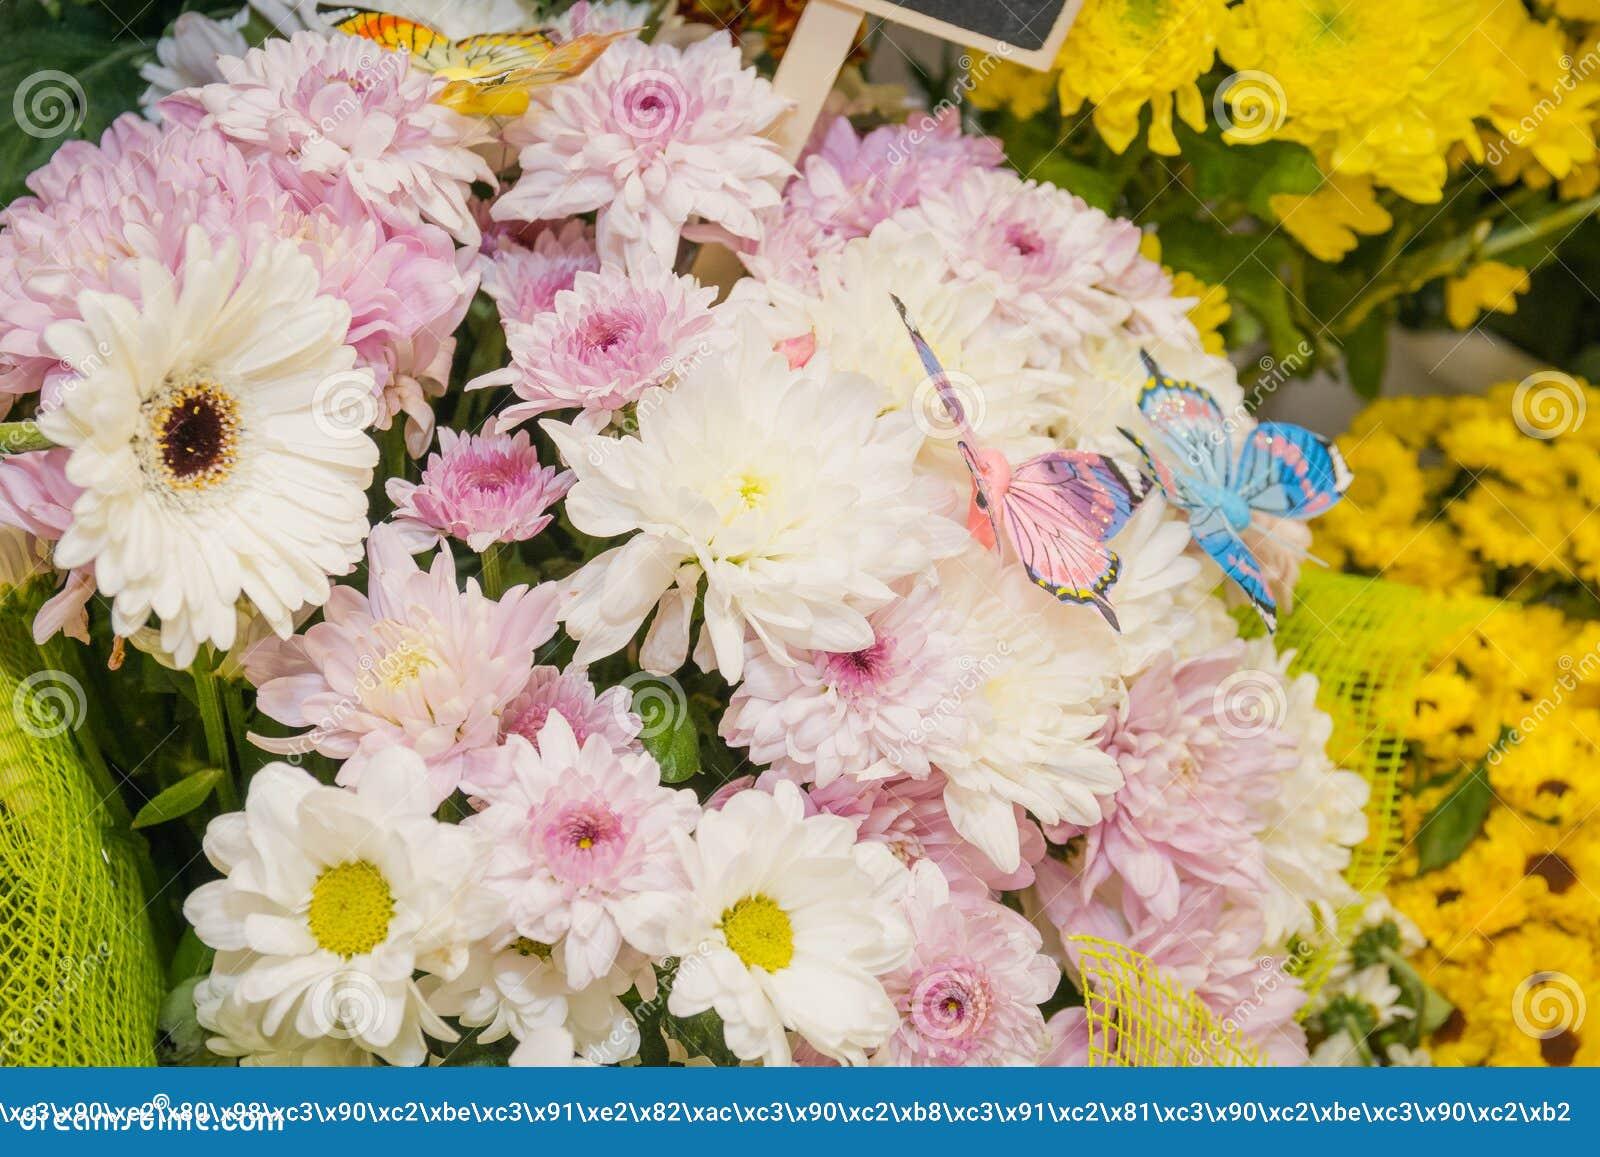 Bouquet of flowers big beautiful bouquet of flowers stock image bouquet of flowers big beautiful bouquet of flowers different flowers izmirmasajfo